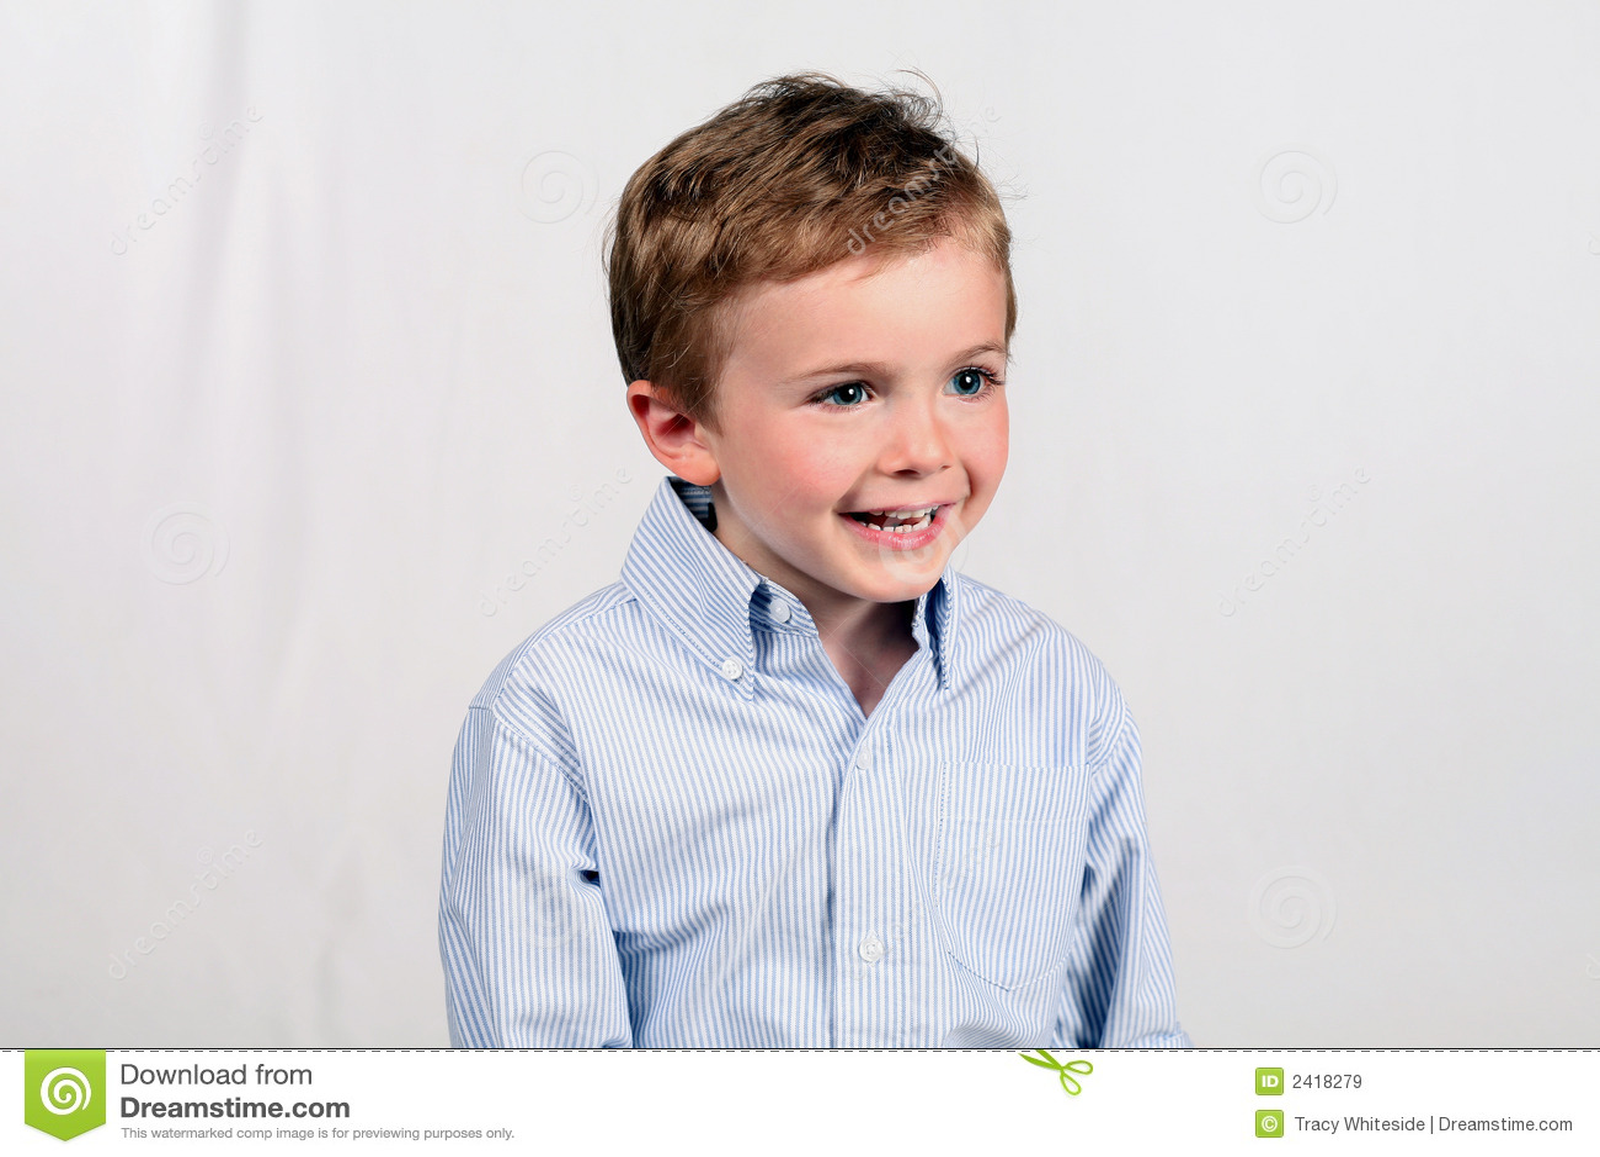 Https Www Dreamstime Com Royalty Free Stock Images Sonny Boy Image2418279